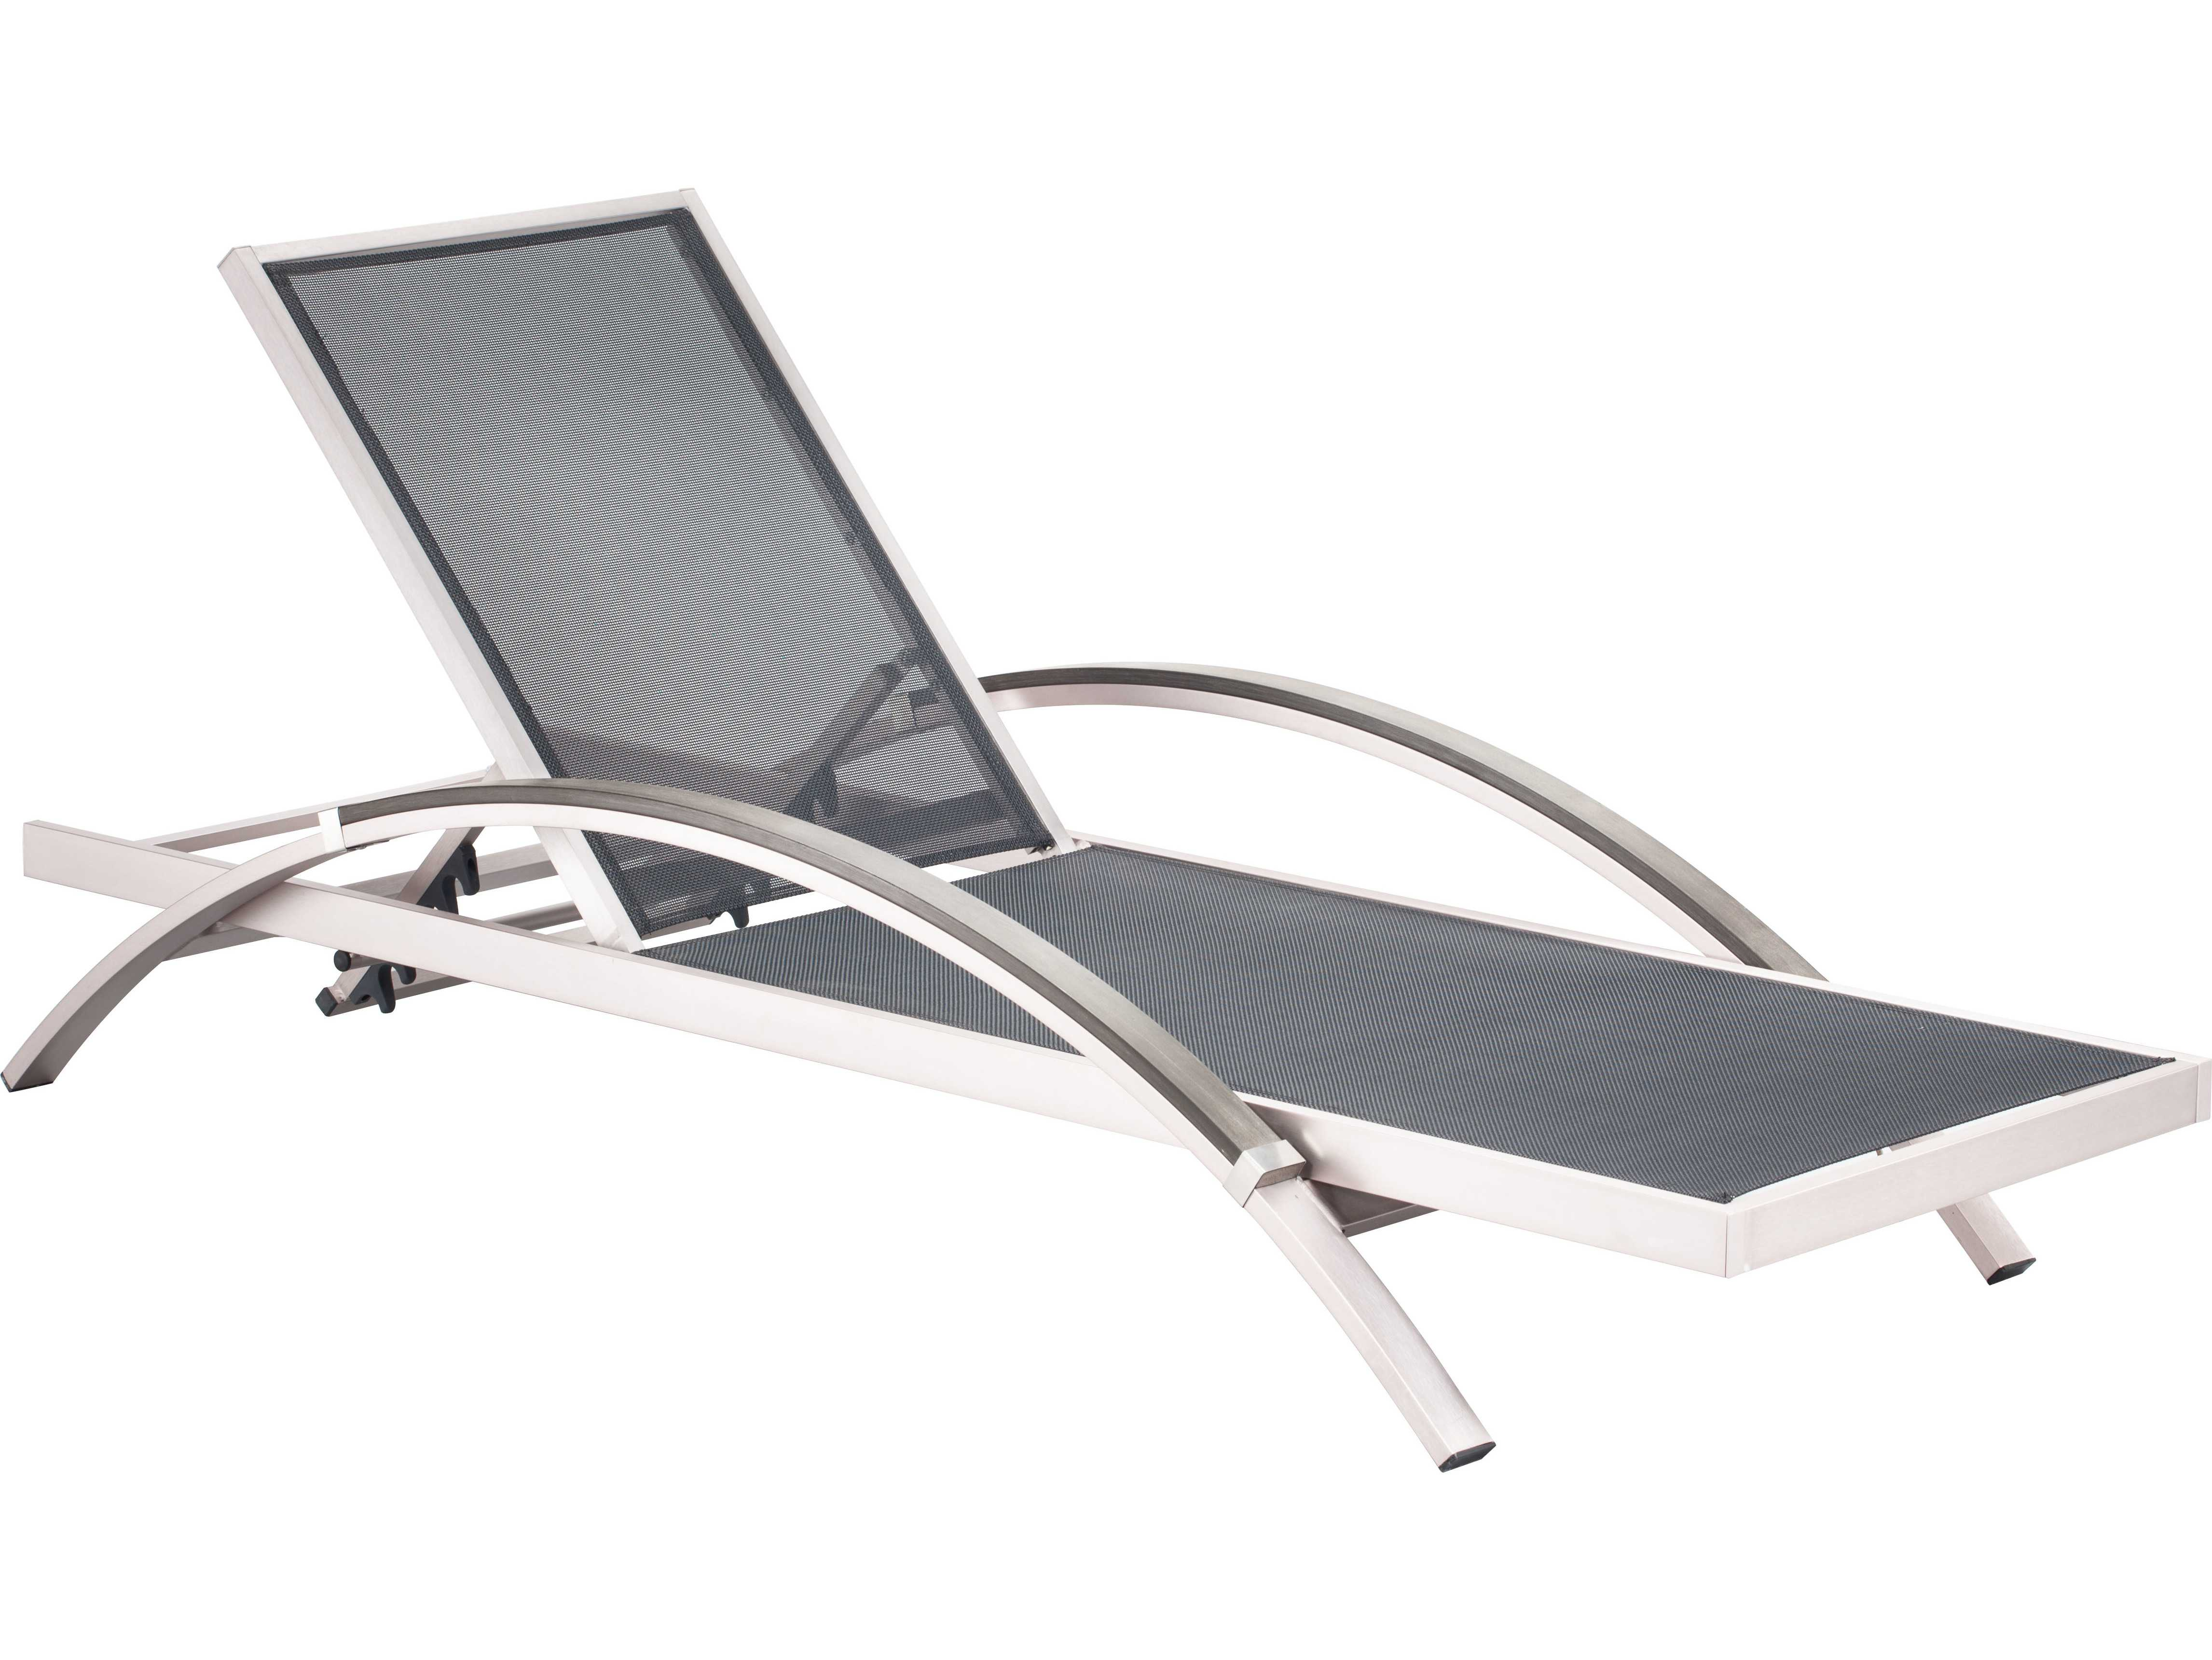 Zuo Outdoor Metropolitan Aluminum Faux Wood Mesh Chaise Lounge